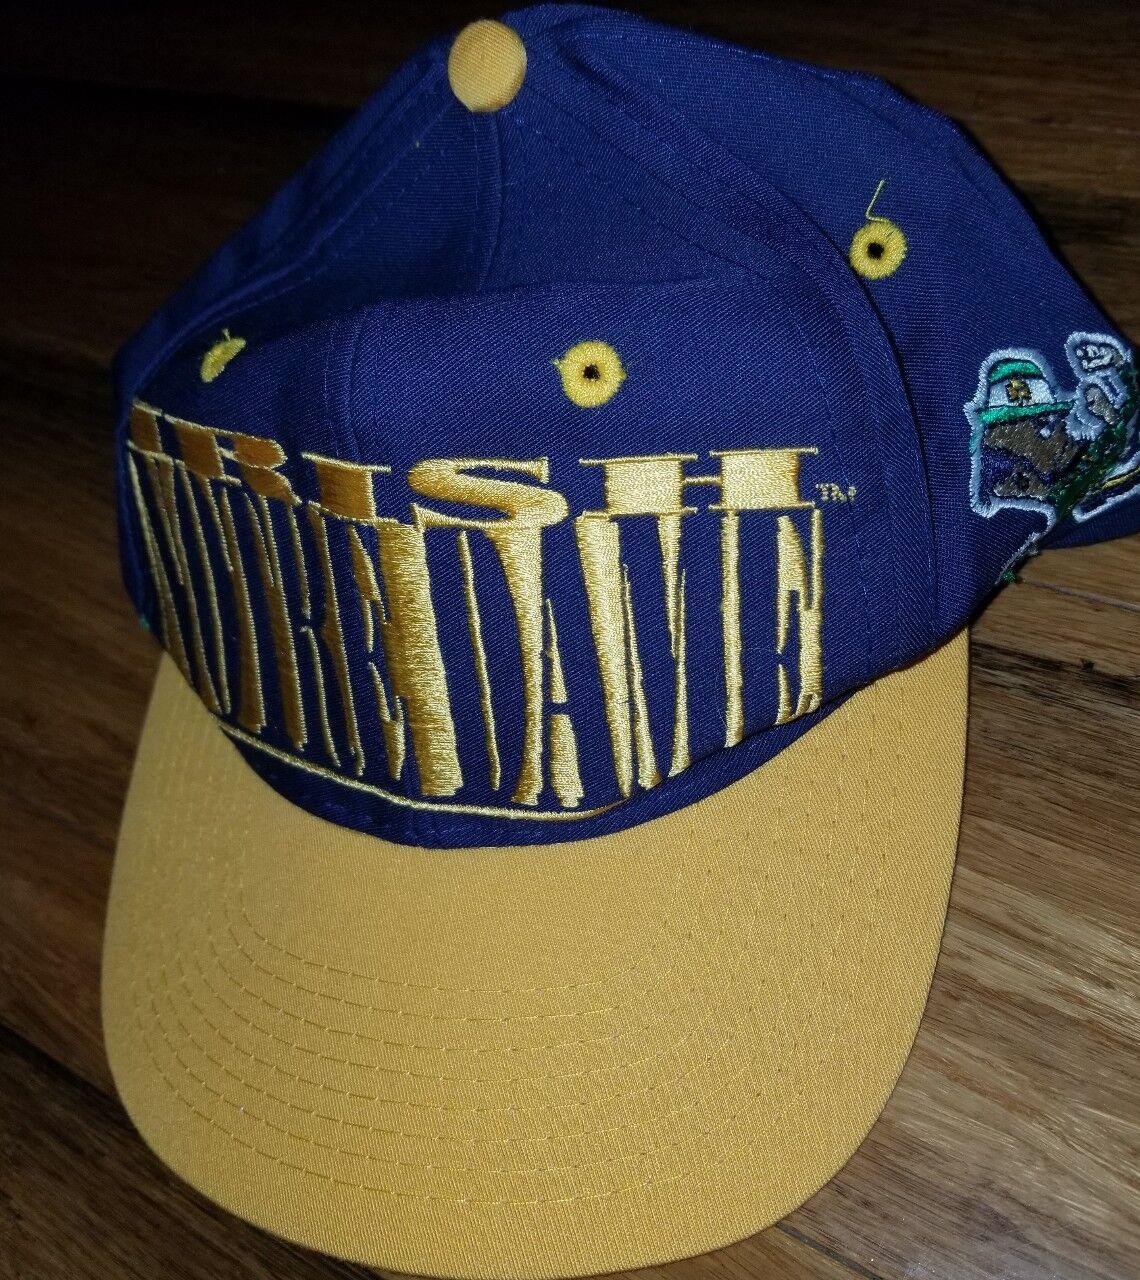 buy online 59581 a2e41 ... promo code for notre dame fighting irish 7 logo 7 irish vintage 90s hat  cap snapback